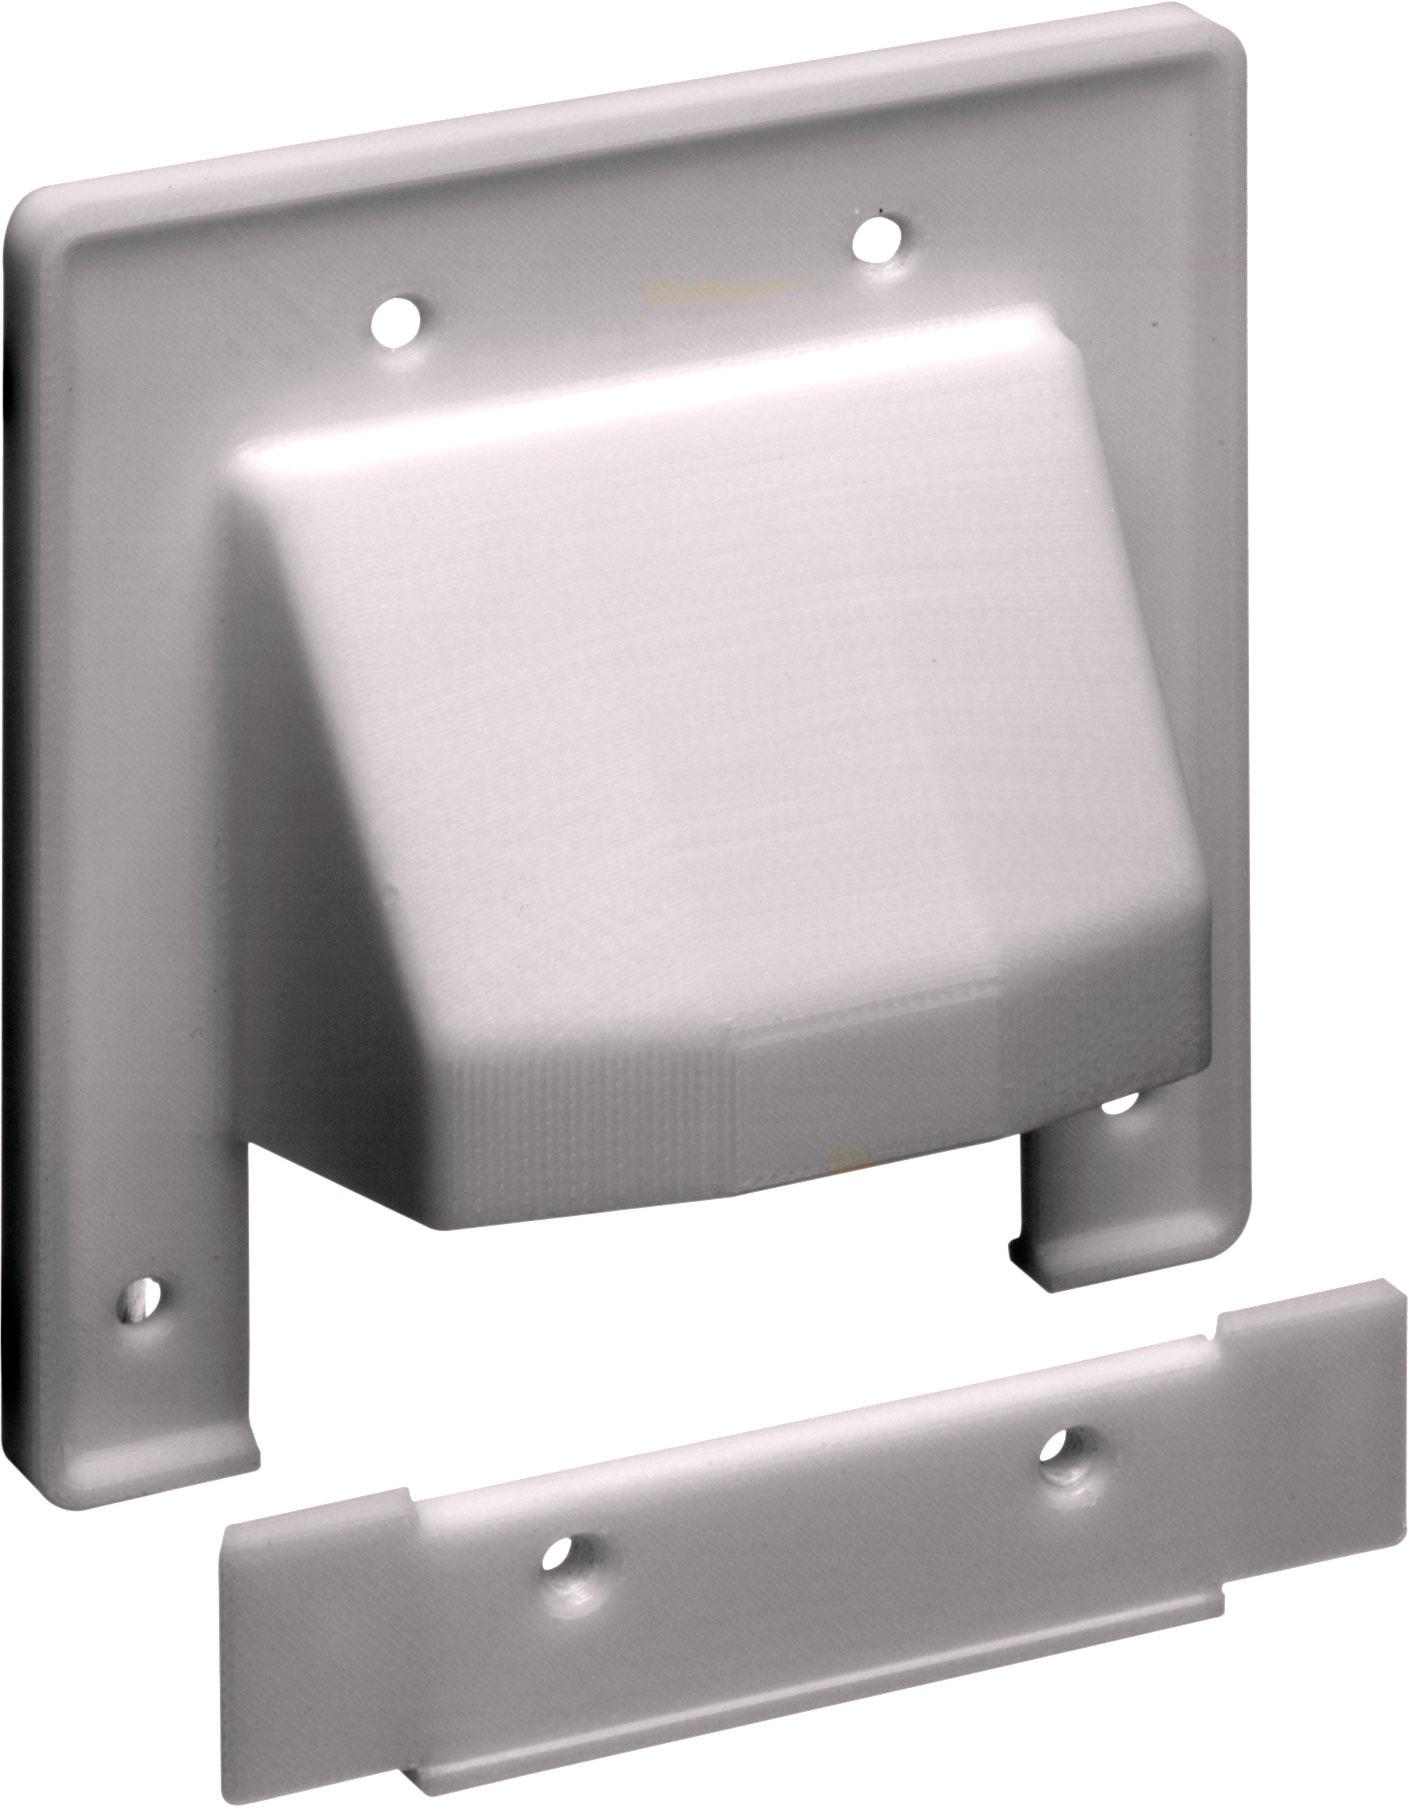 Low Voltage Faceplate : Arlington cer gang reversible piece low voltage cable